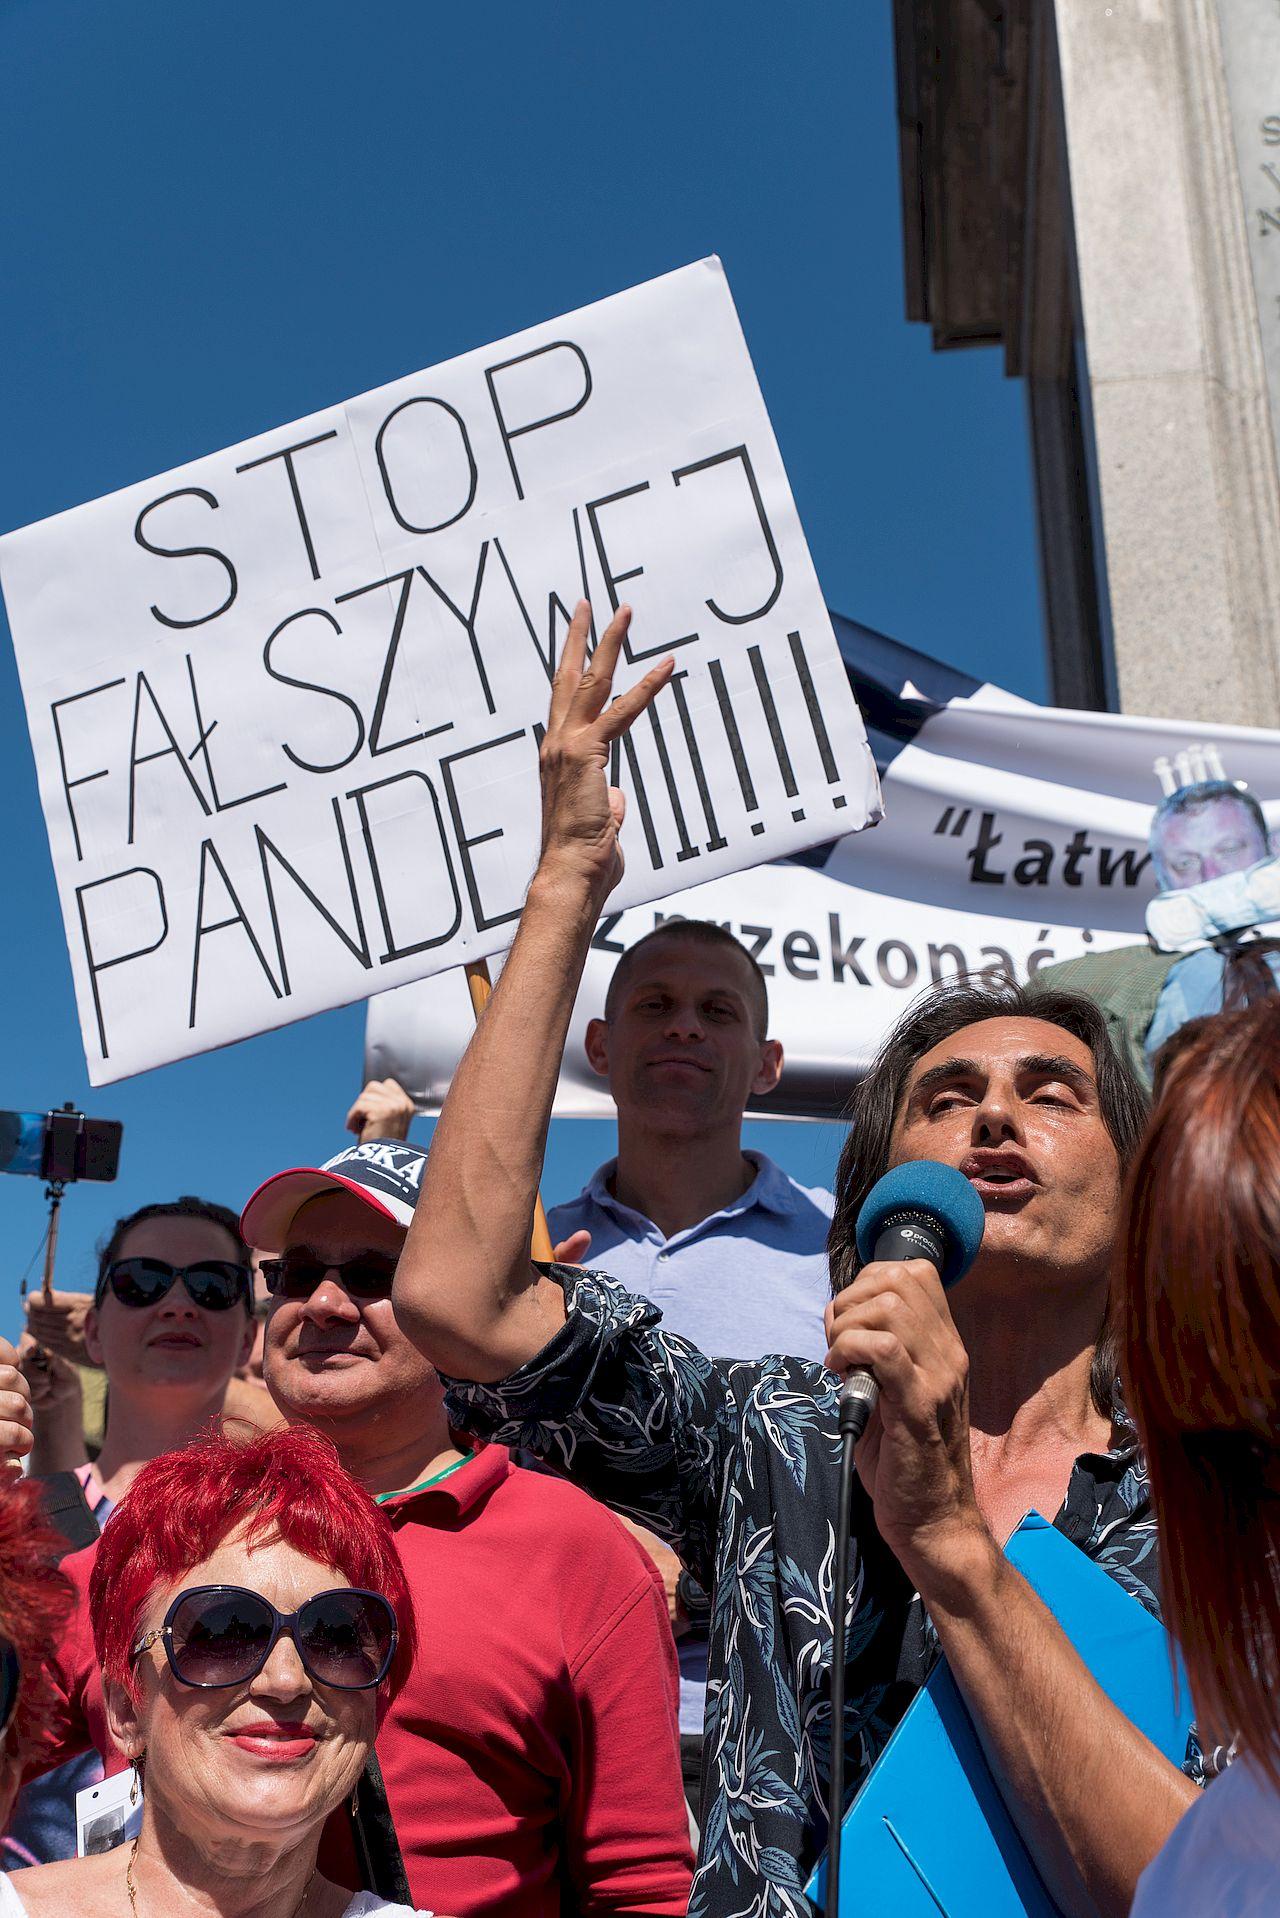 Protest Zakonczyć Pandemię - Ivan Komarenko